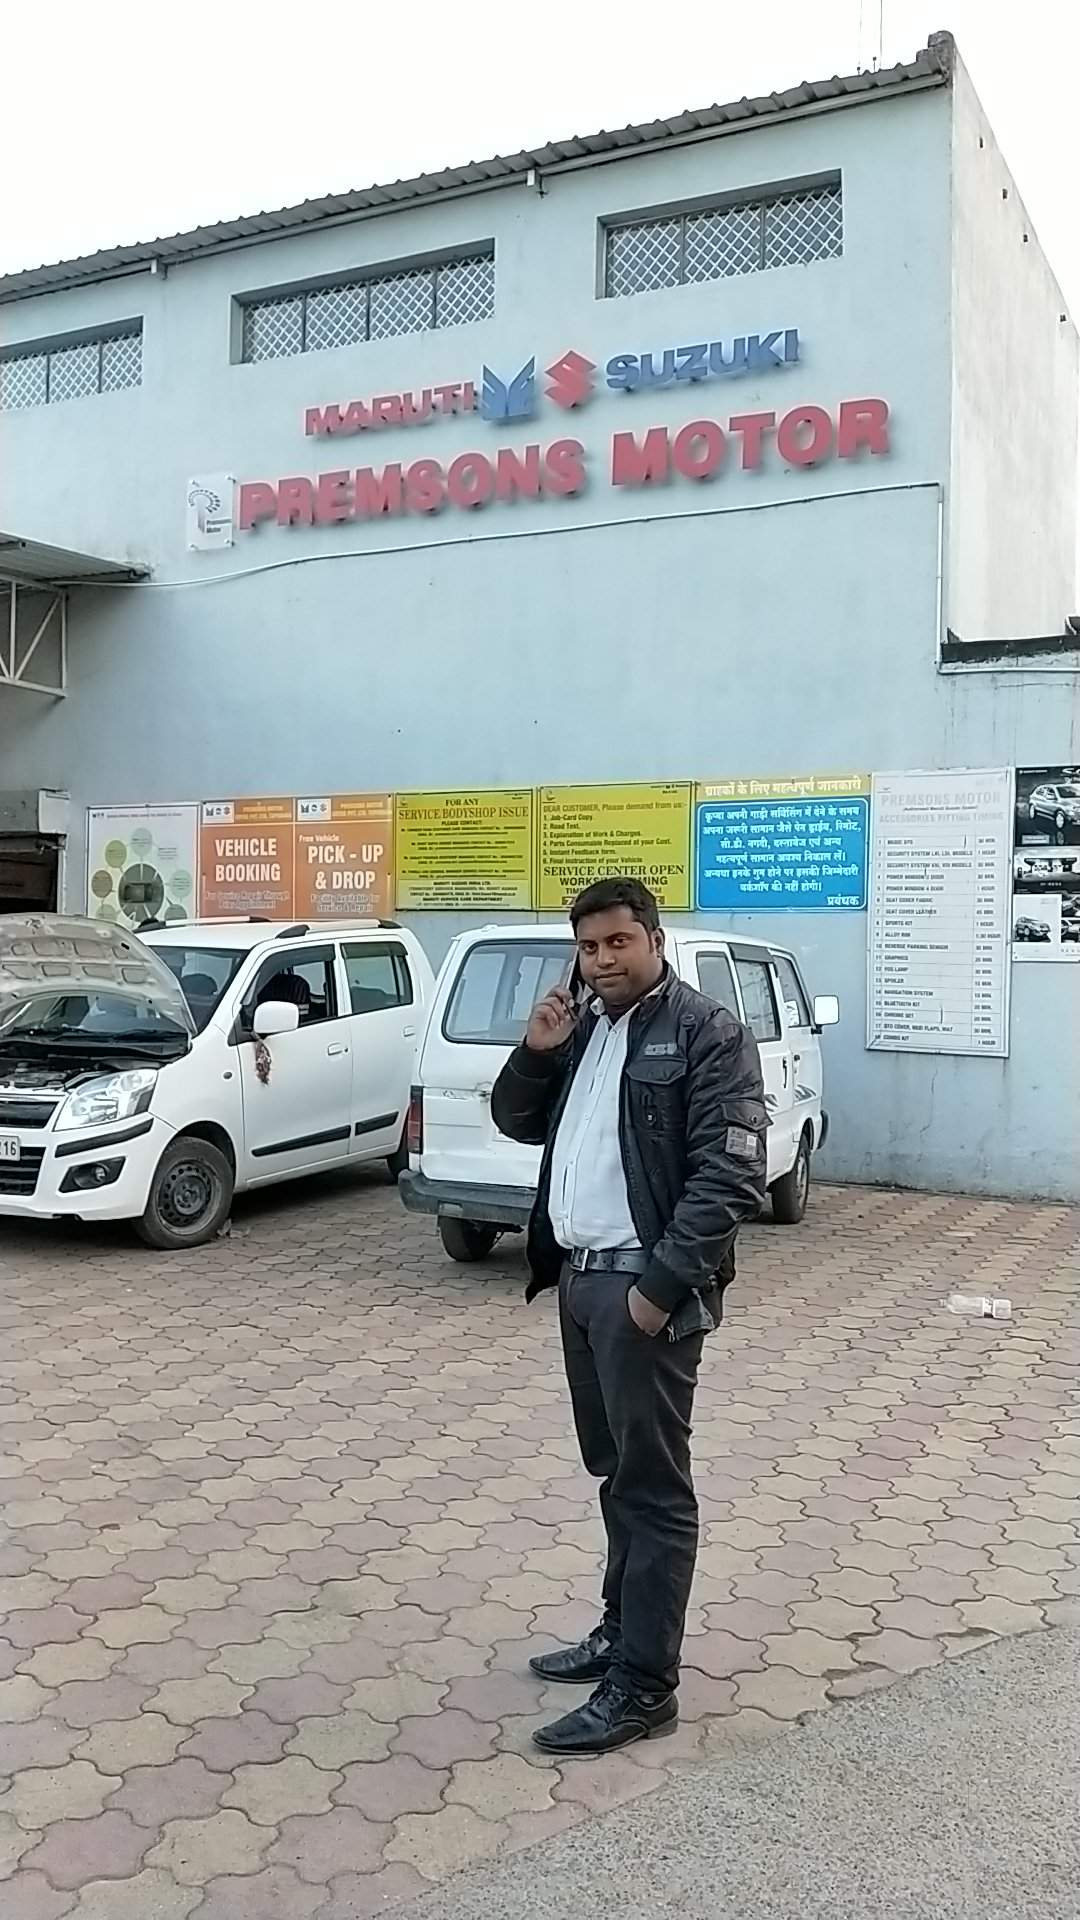 Premsons Motors Tupudana Car Repair Services In Ranchi Justdial